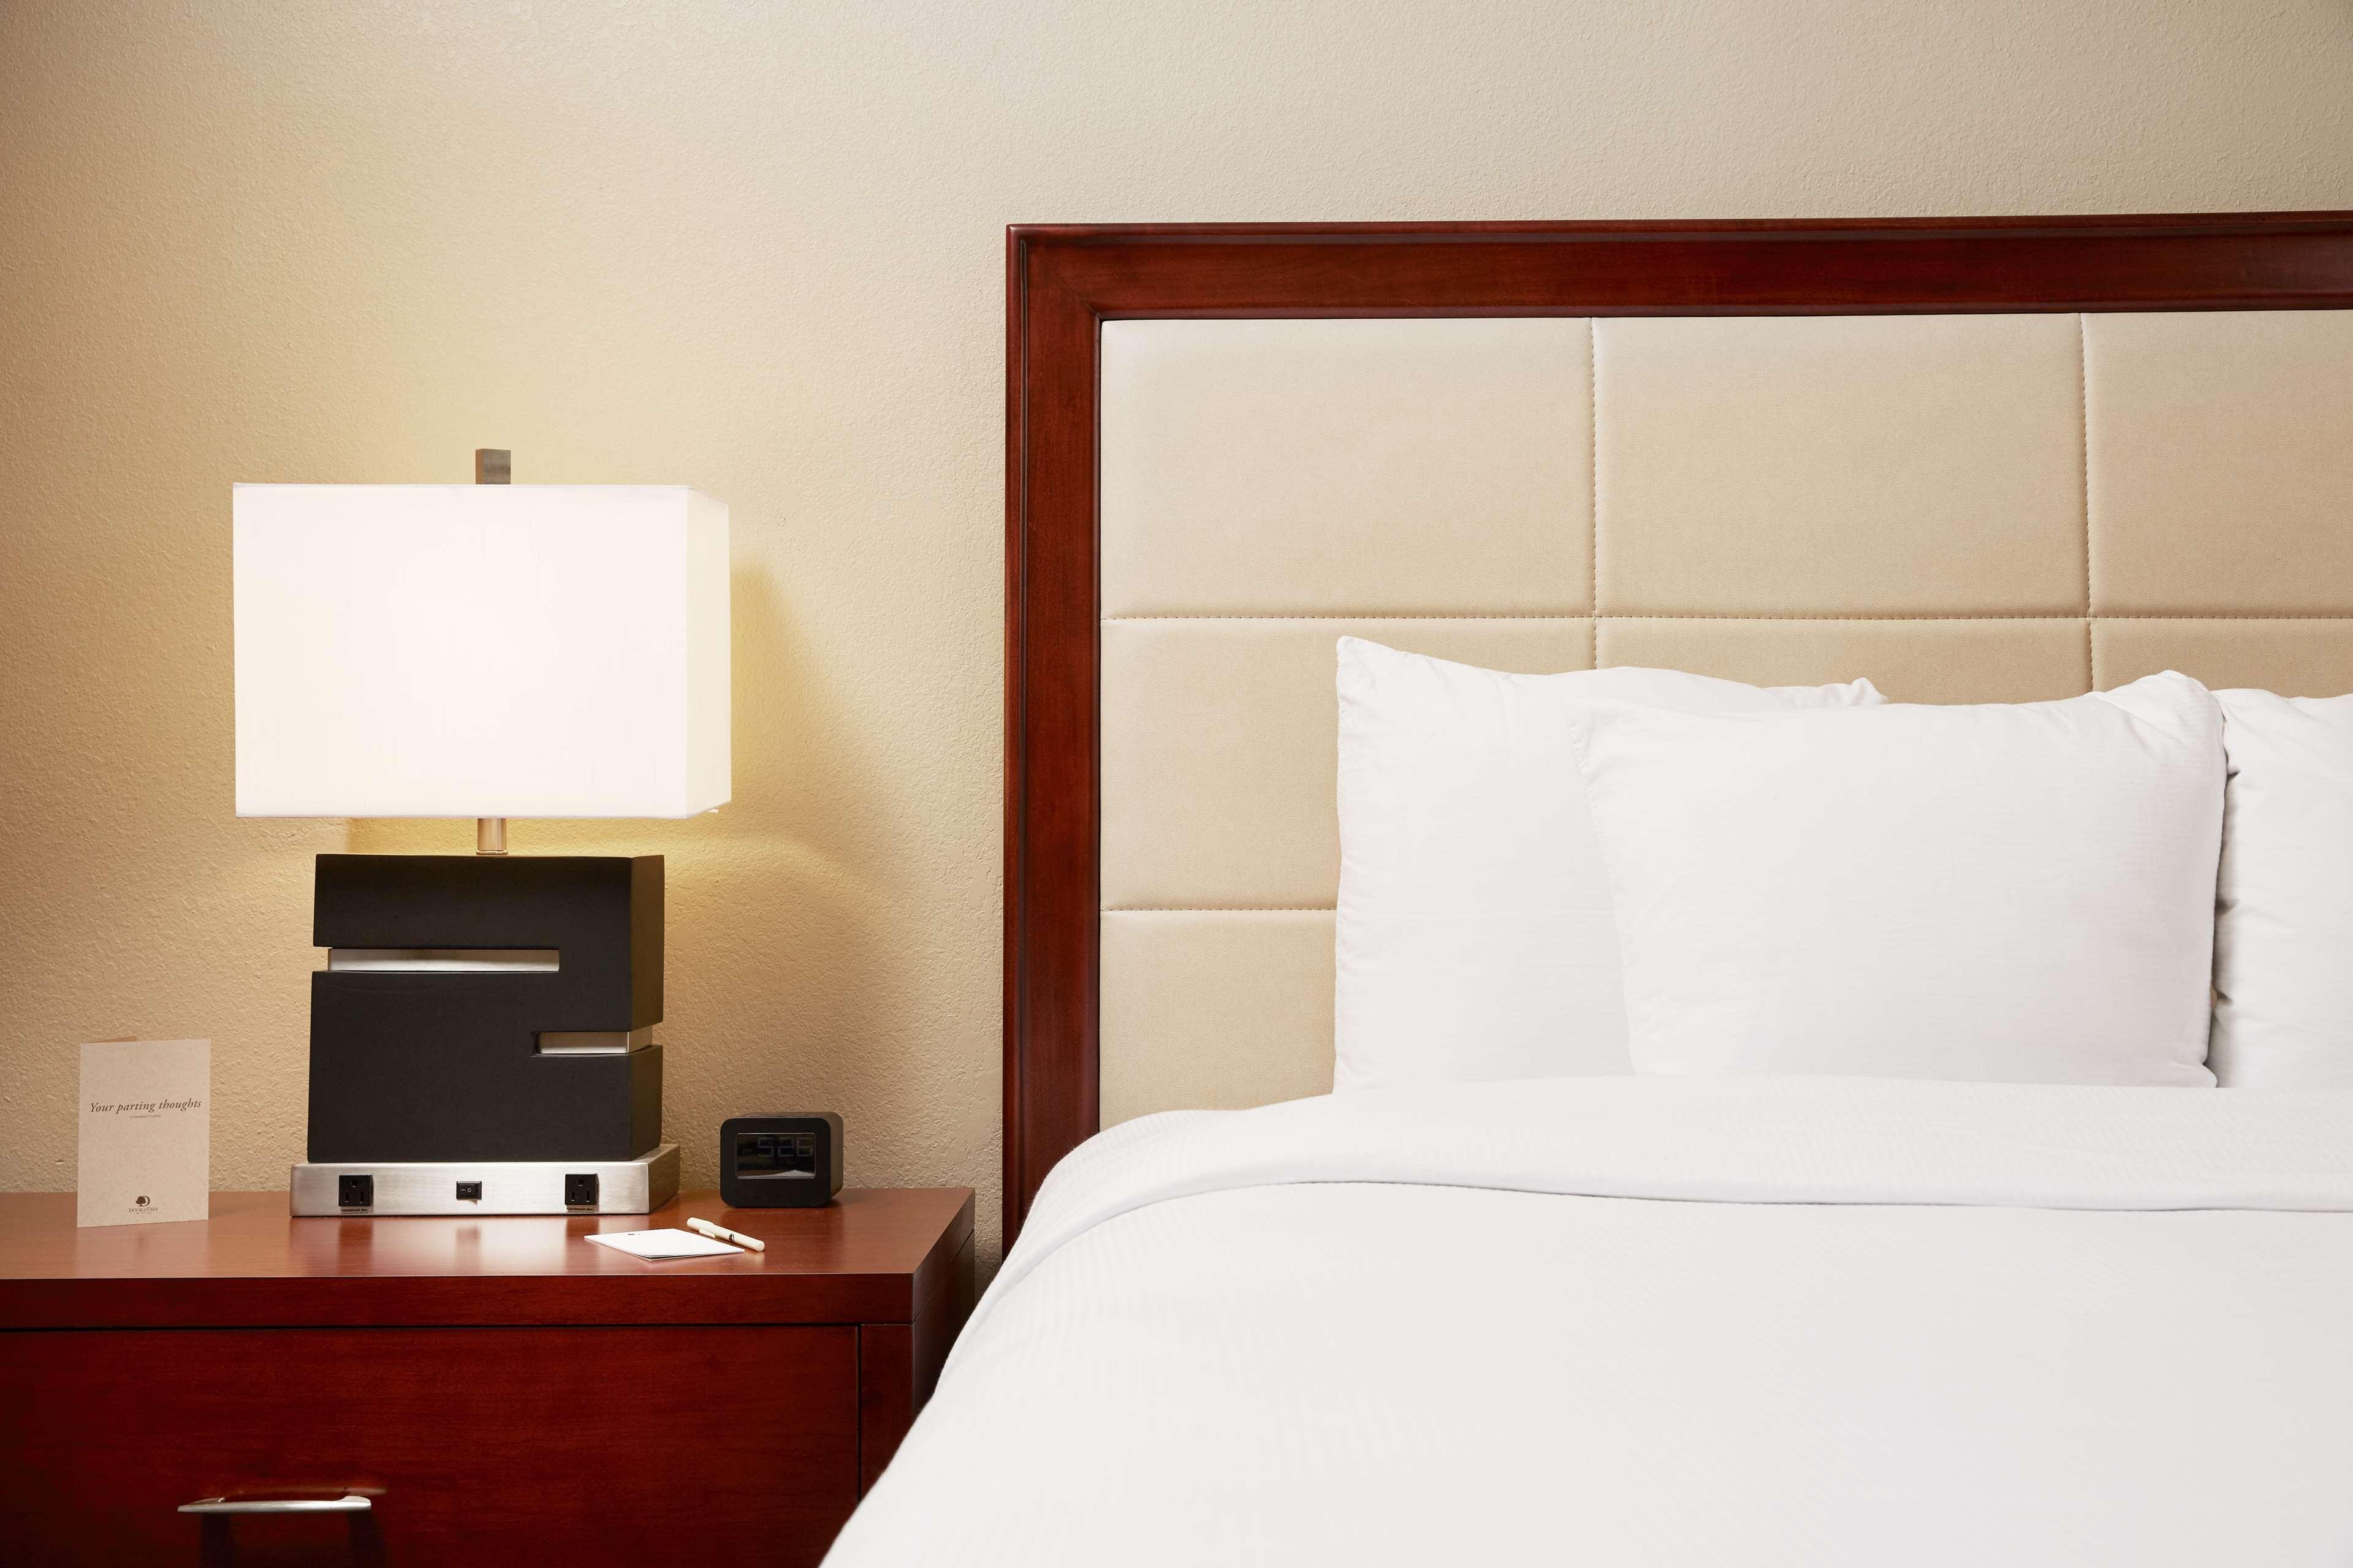 DoubleTree Suites by Hilton Hotel Cincinnati - Blue Ash image 16